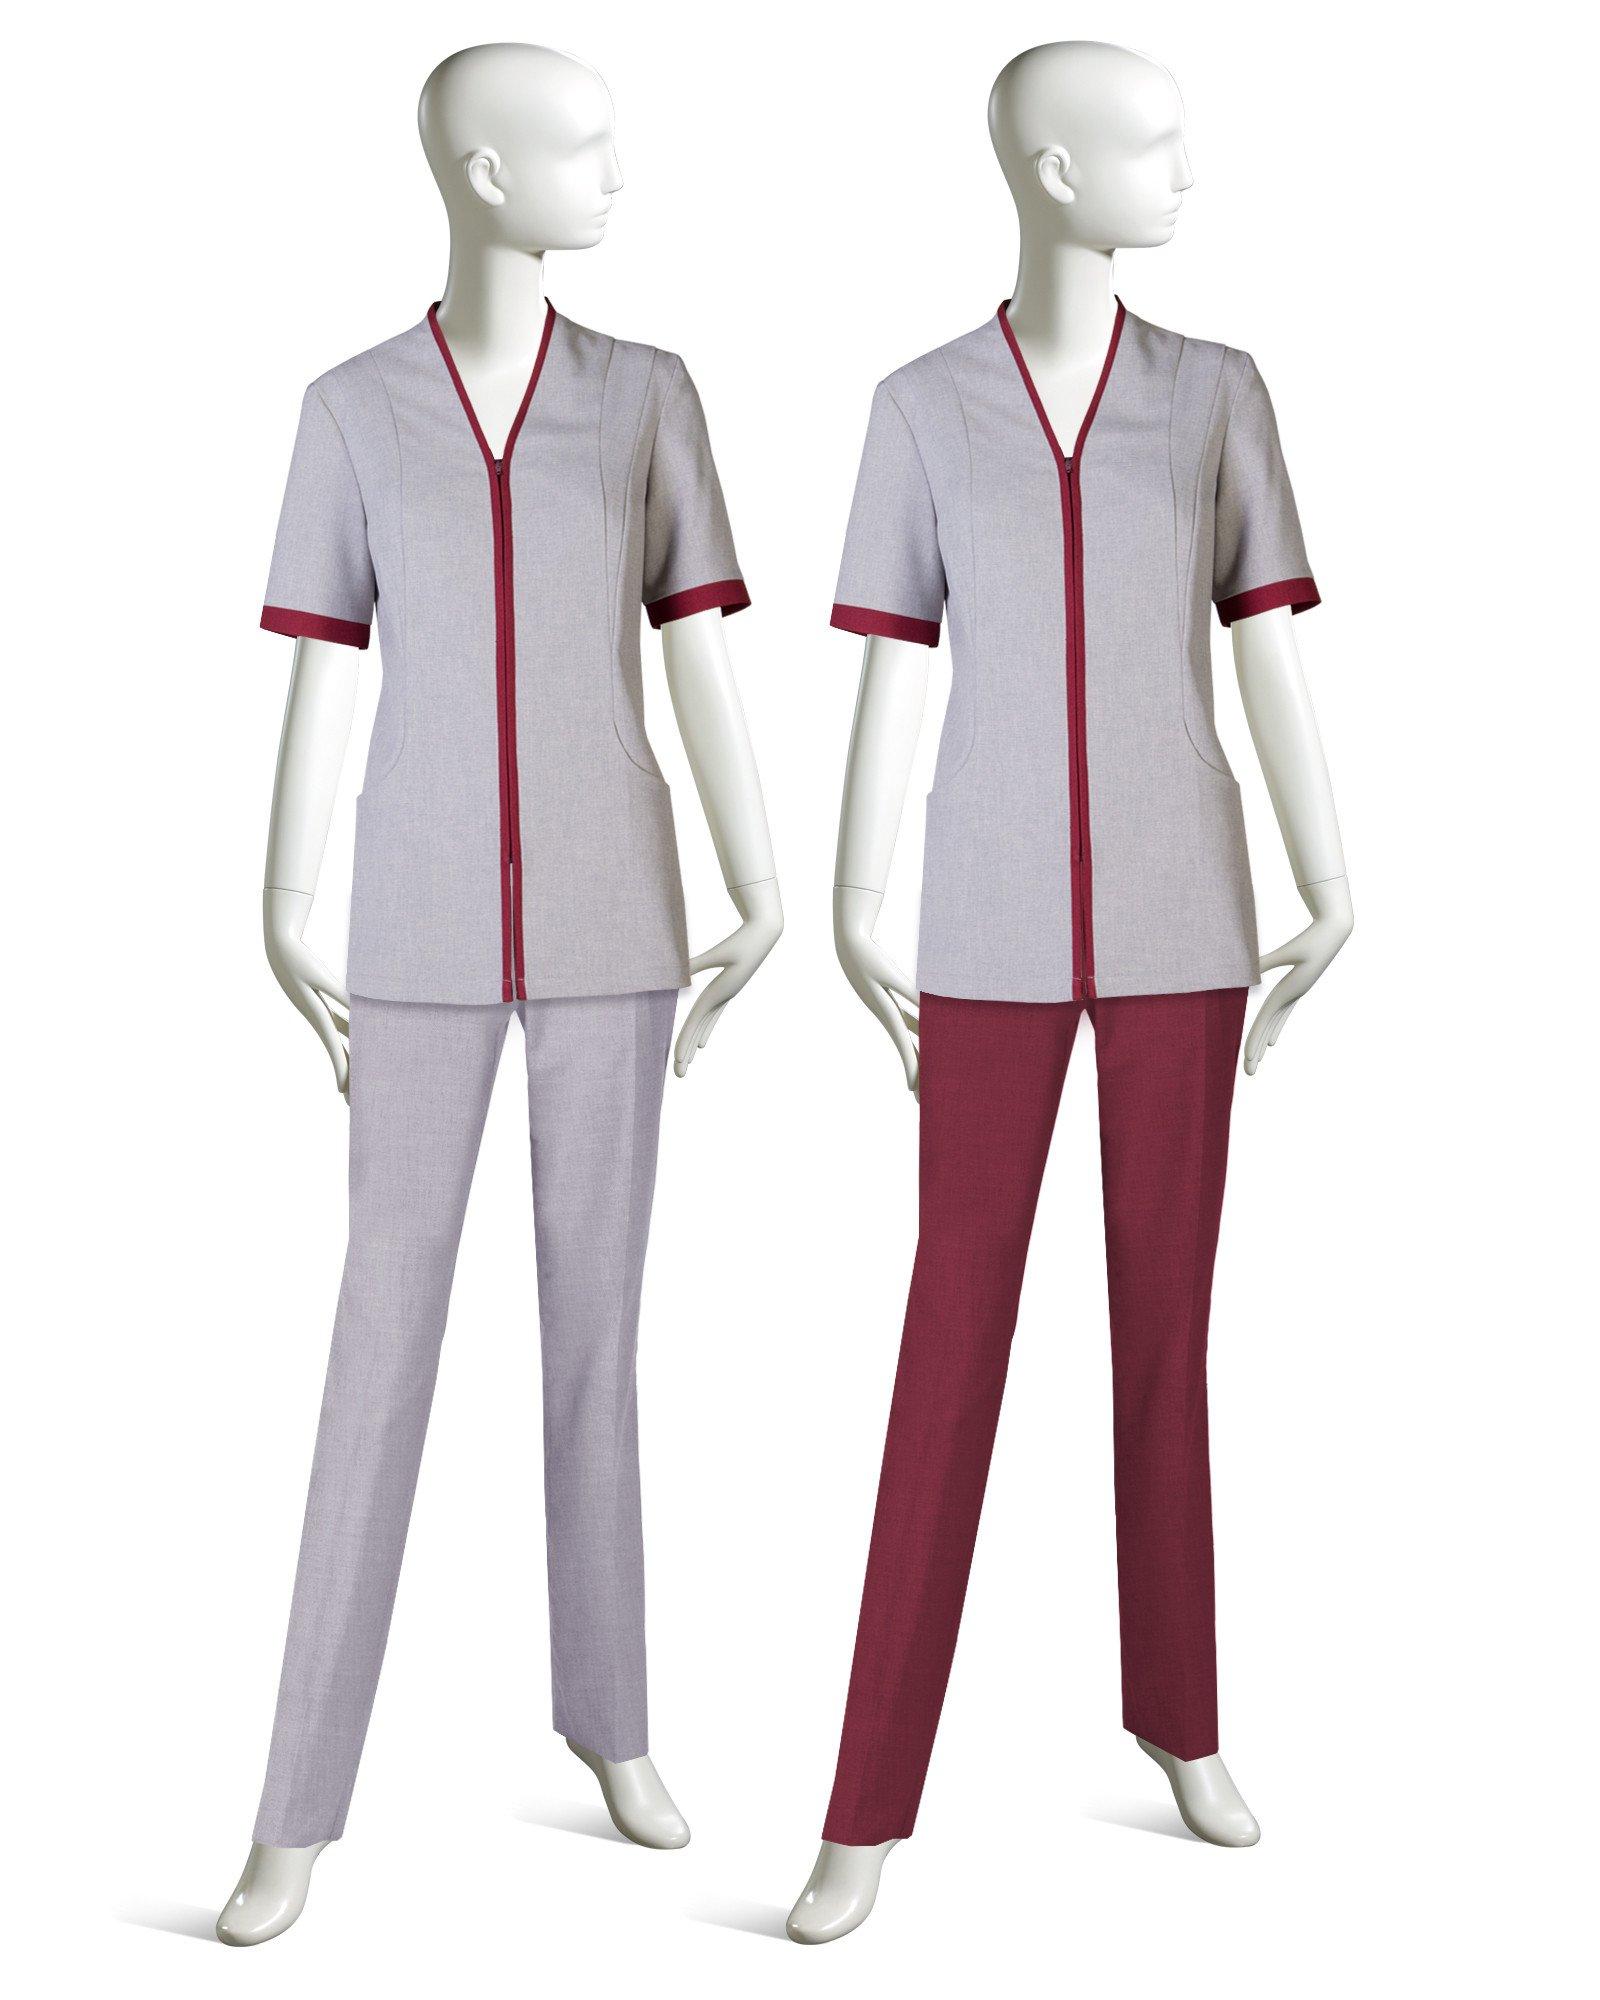 Hk135 for Uniform spa manager